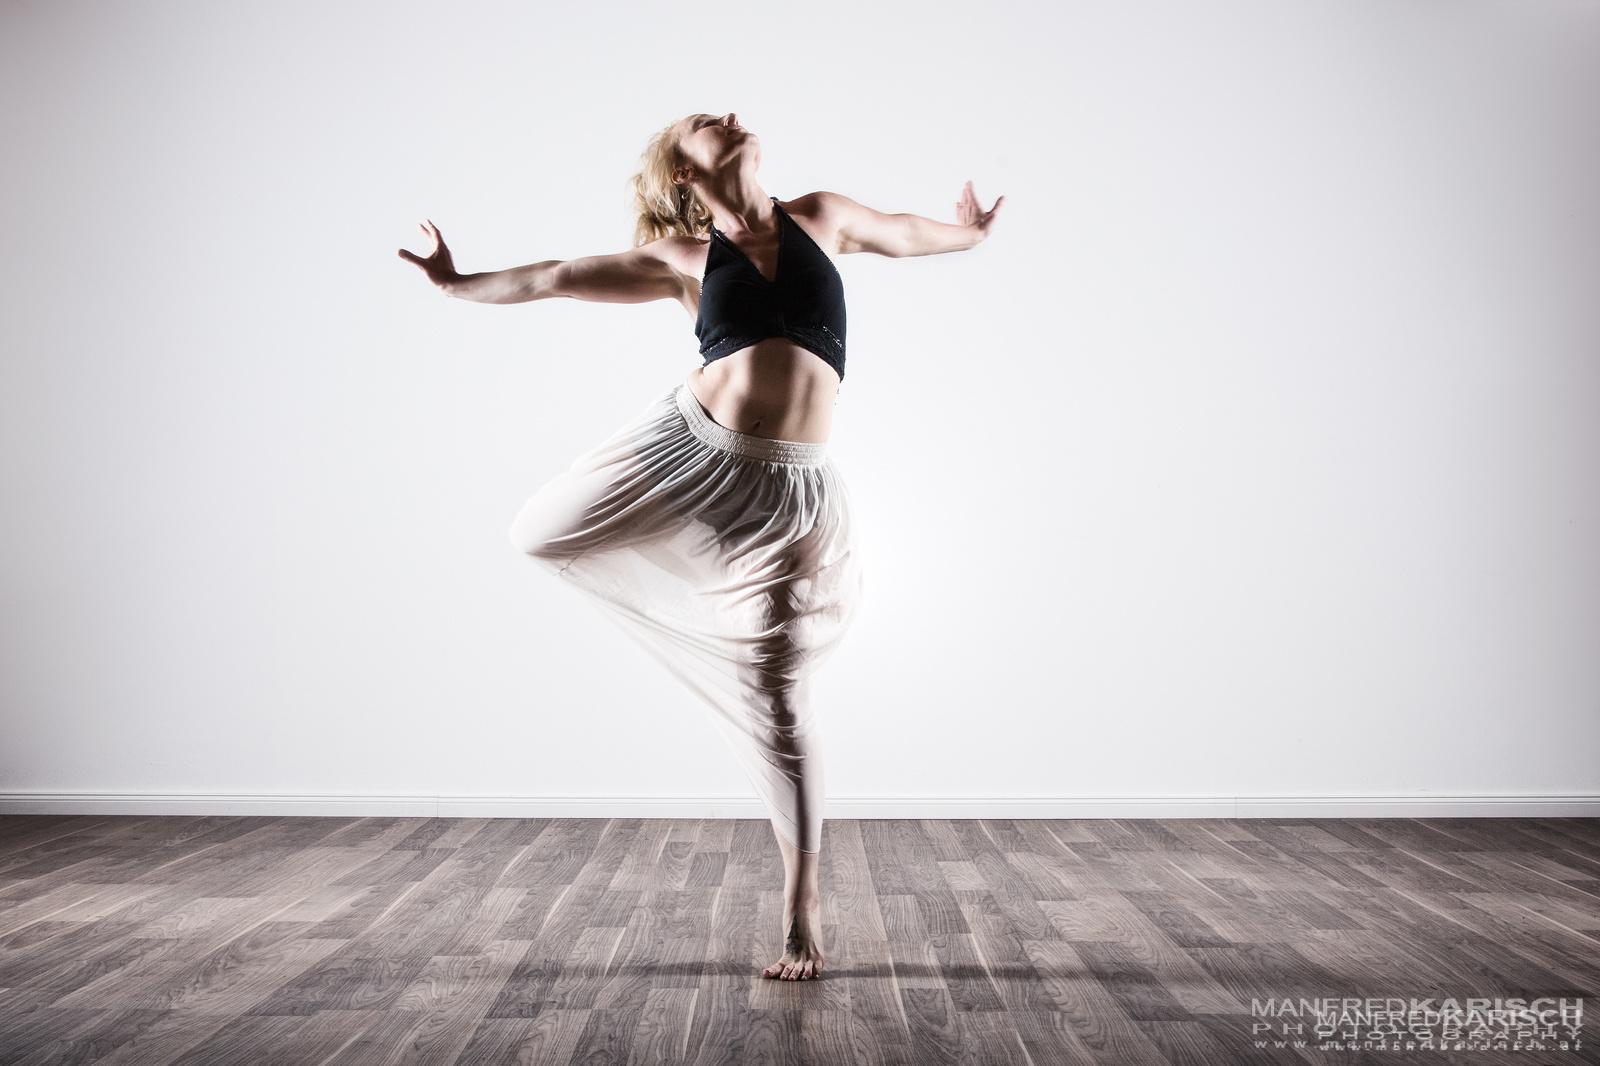 Manfred Karisch dance photography